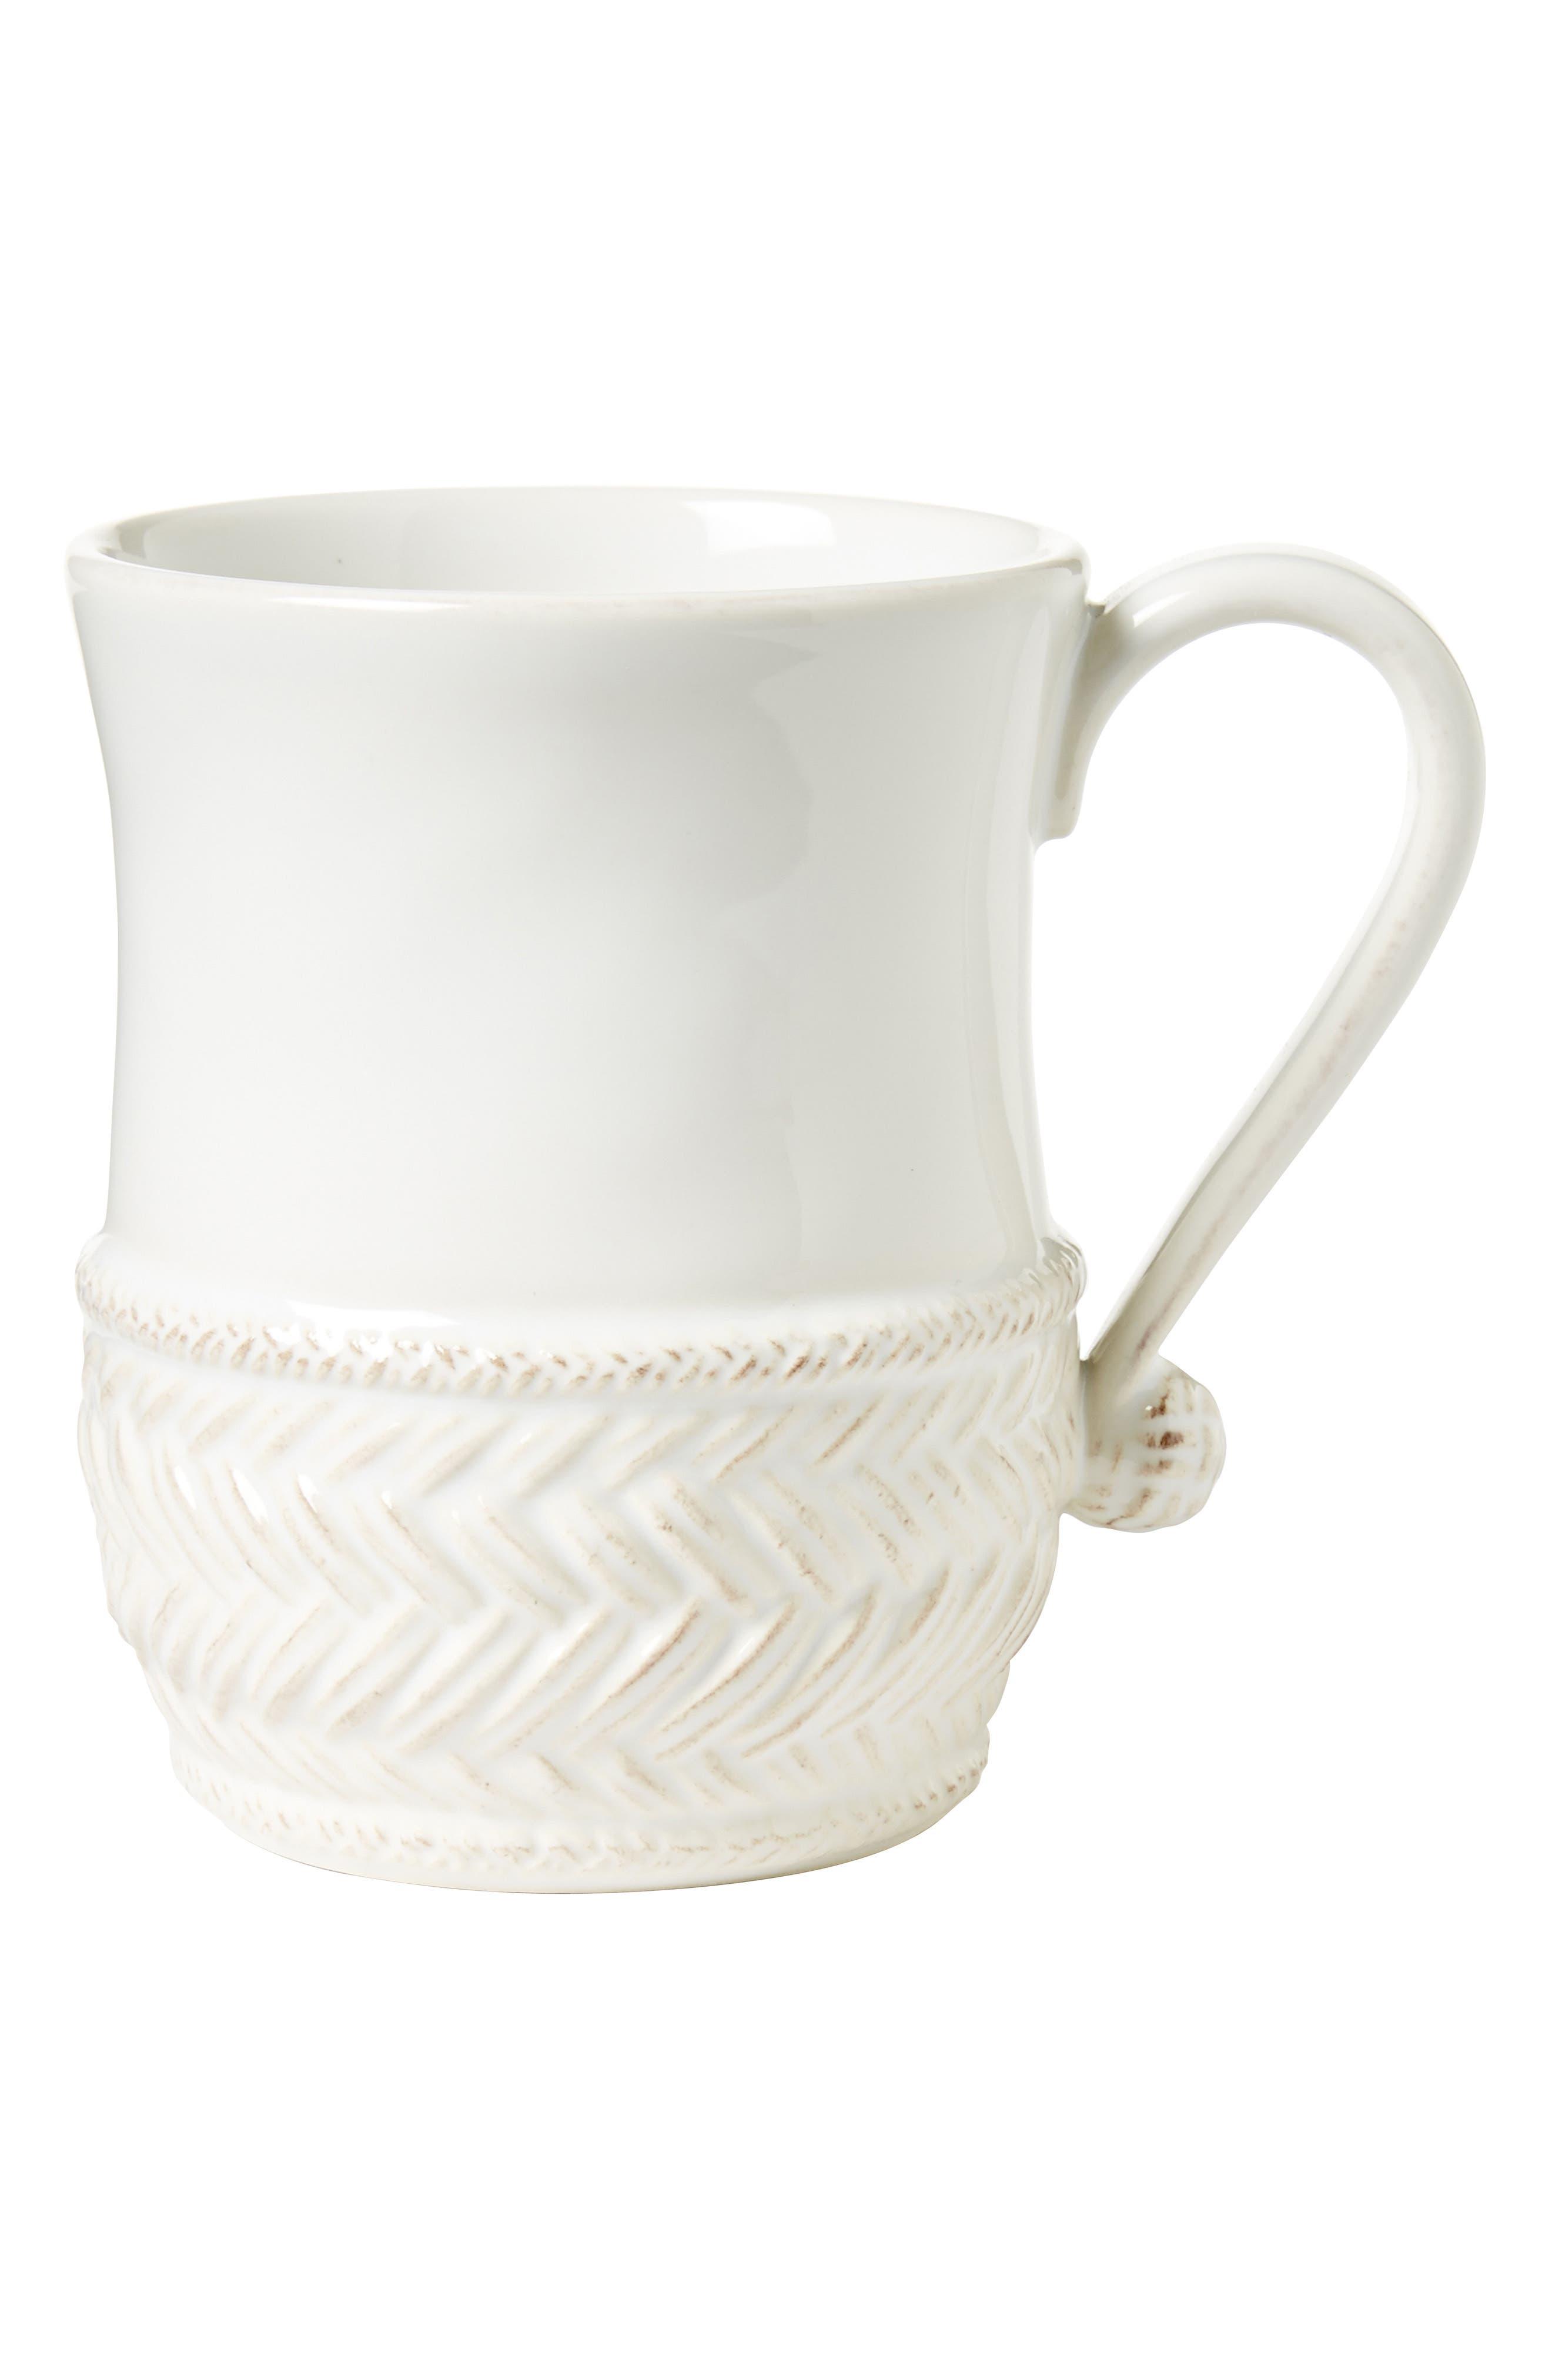 Alternate Image 1 Selected - Juliska Le Panier Ceramic Mug